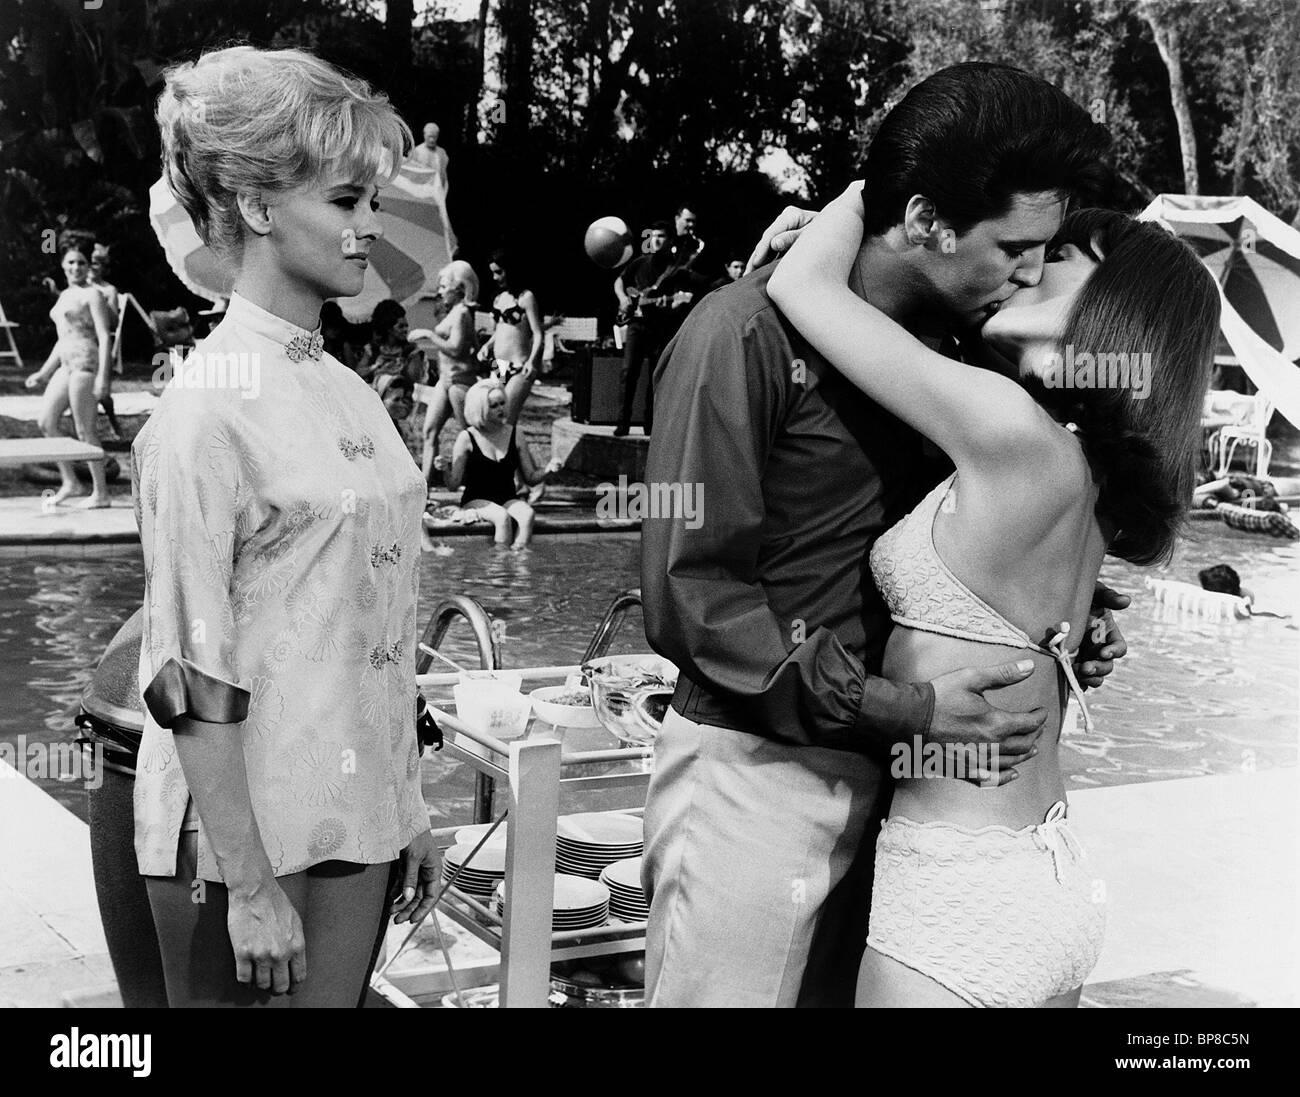 Maricris Garcia (b. 1987),Laura Ashley Samuels Hot pics & movies Lynne Carver,Laurance Rudic (born 1952)